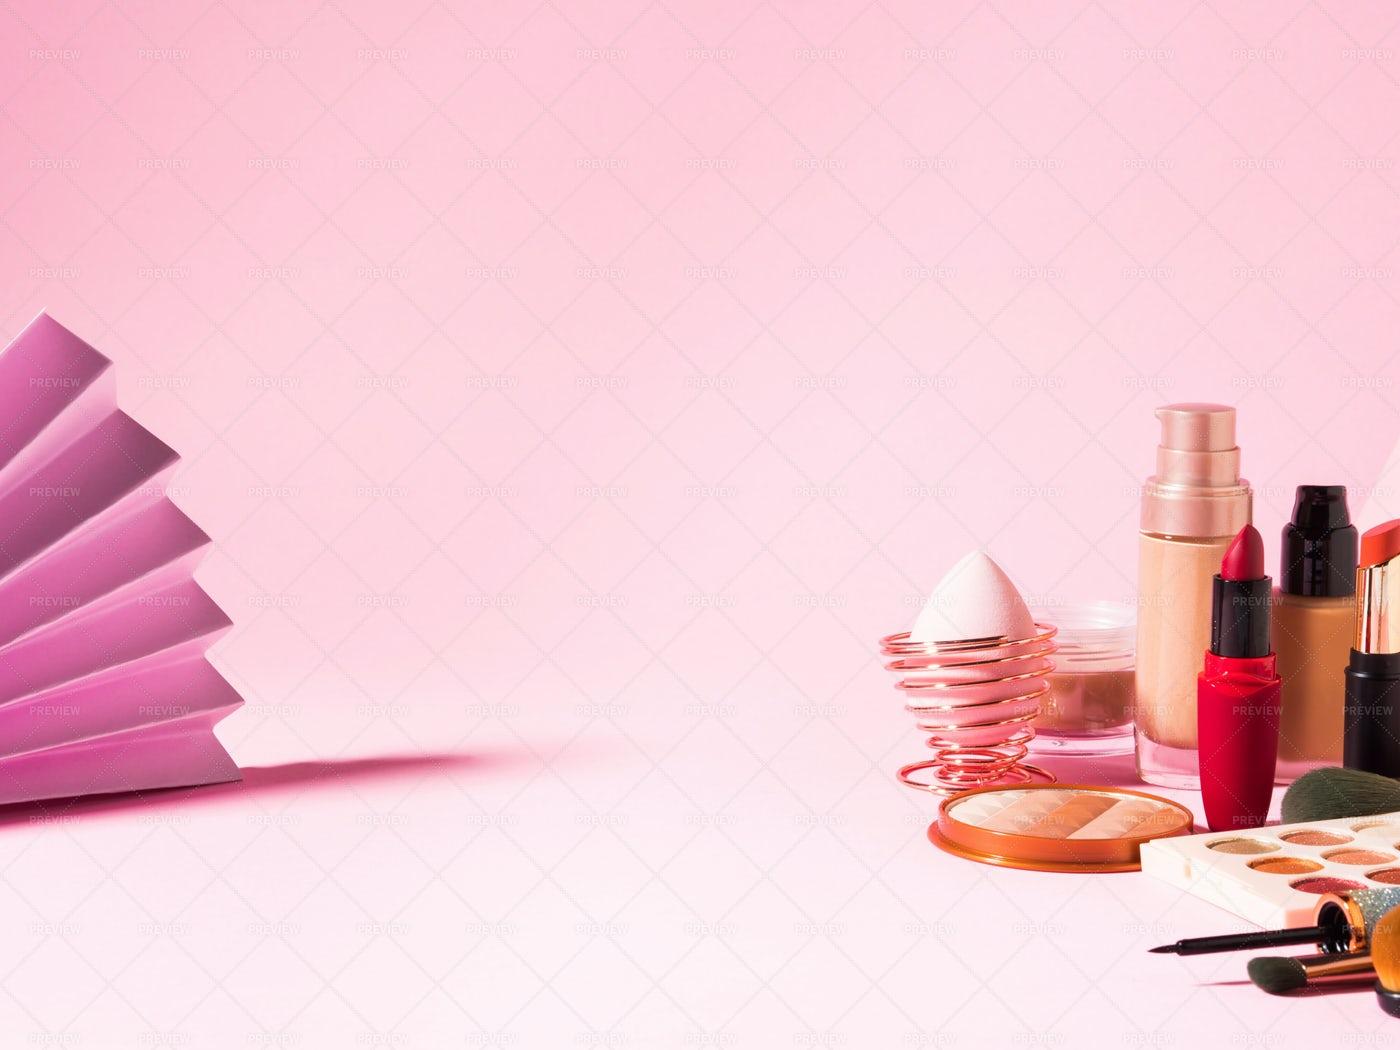 Make Up Beauty Background: Stock Photos